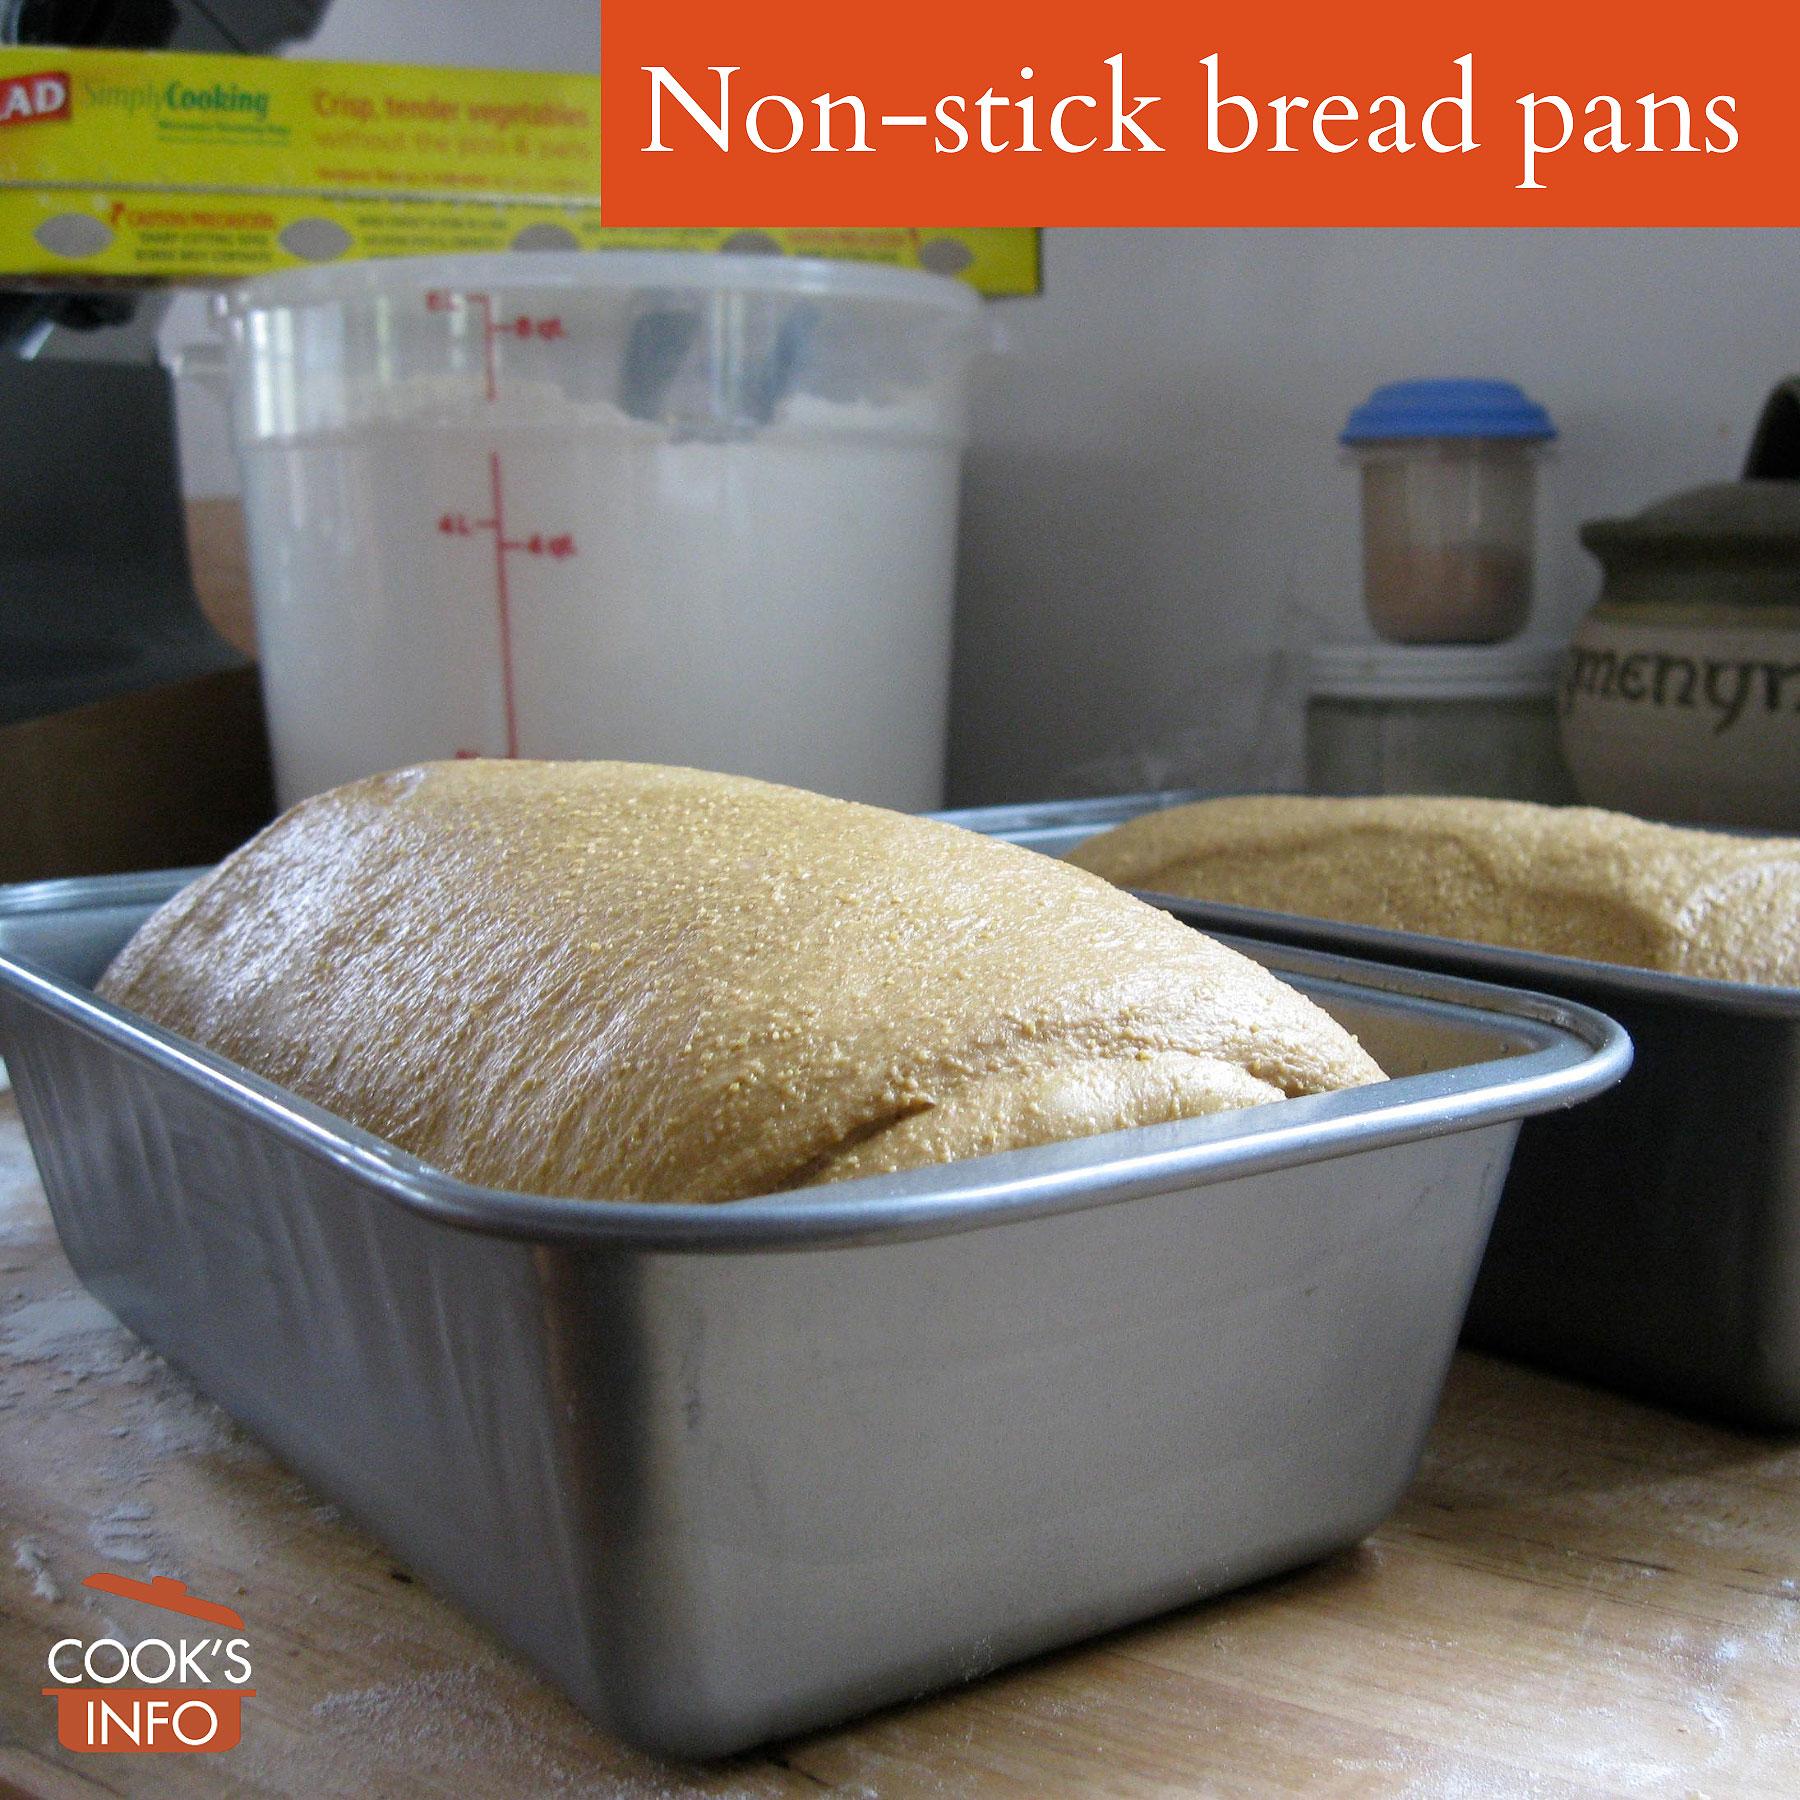 Non-stick bread pans